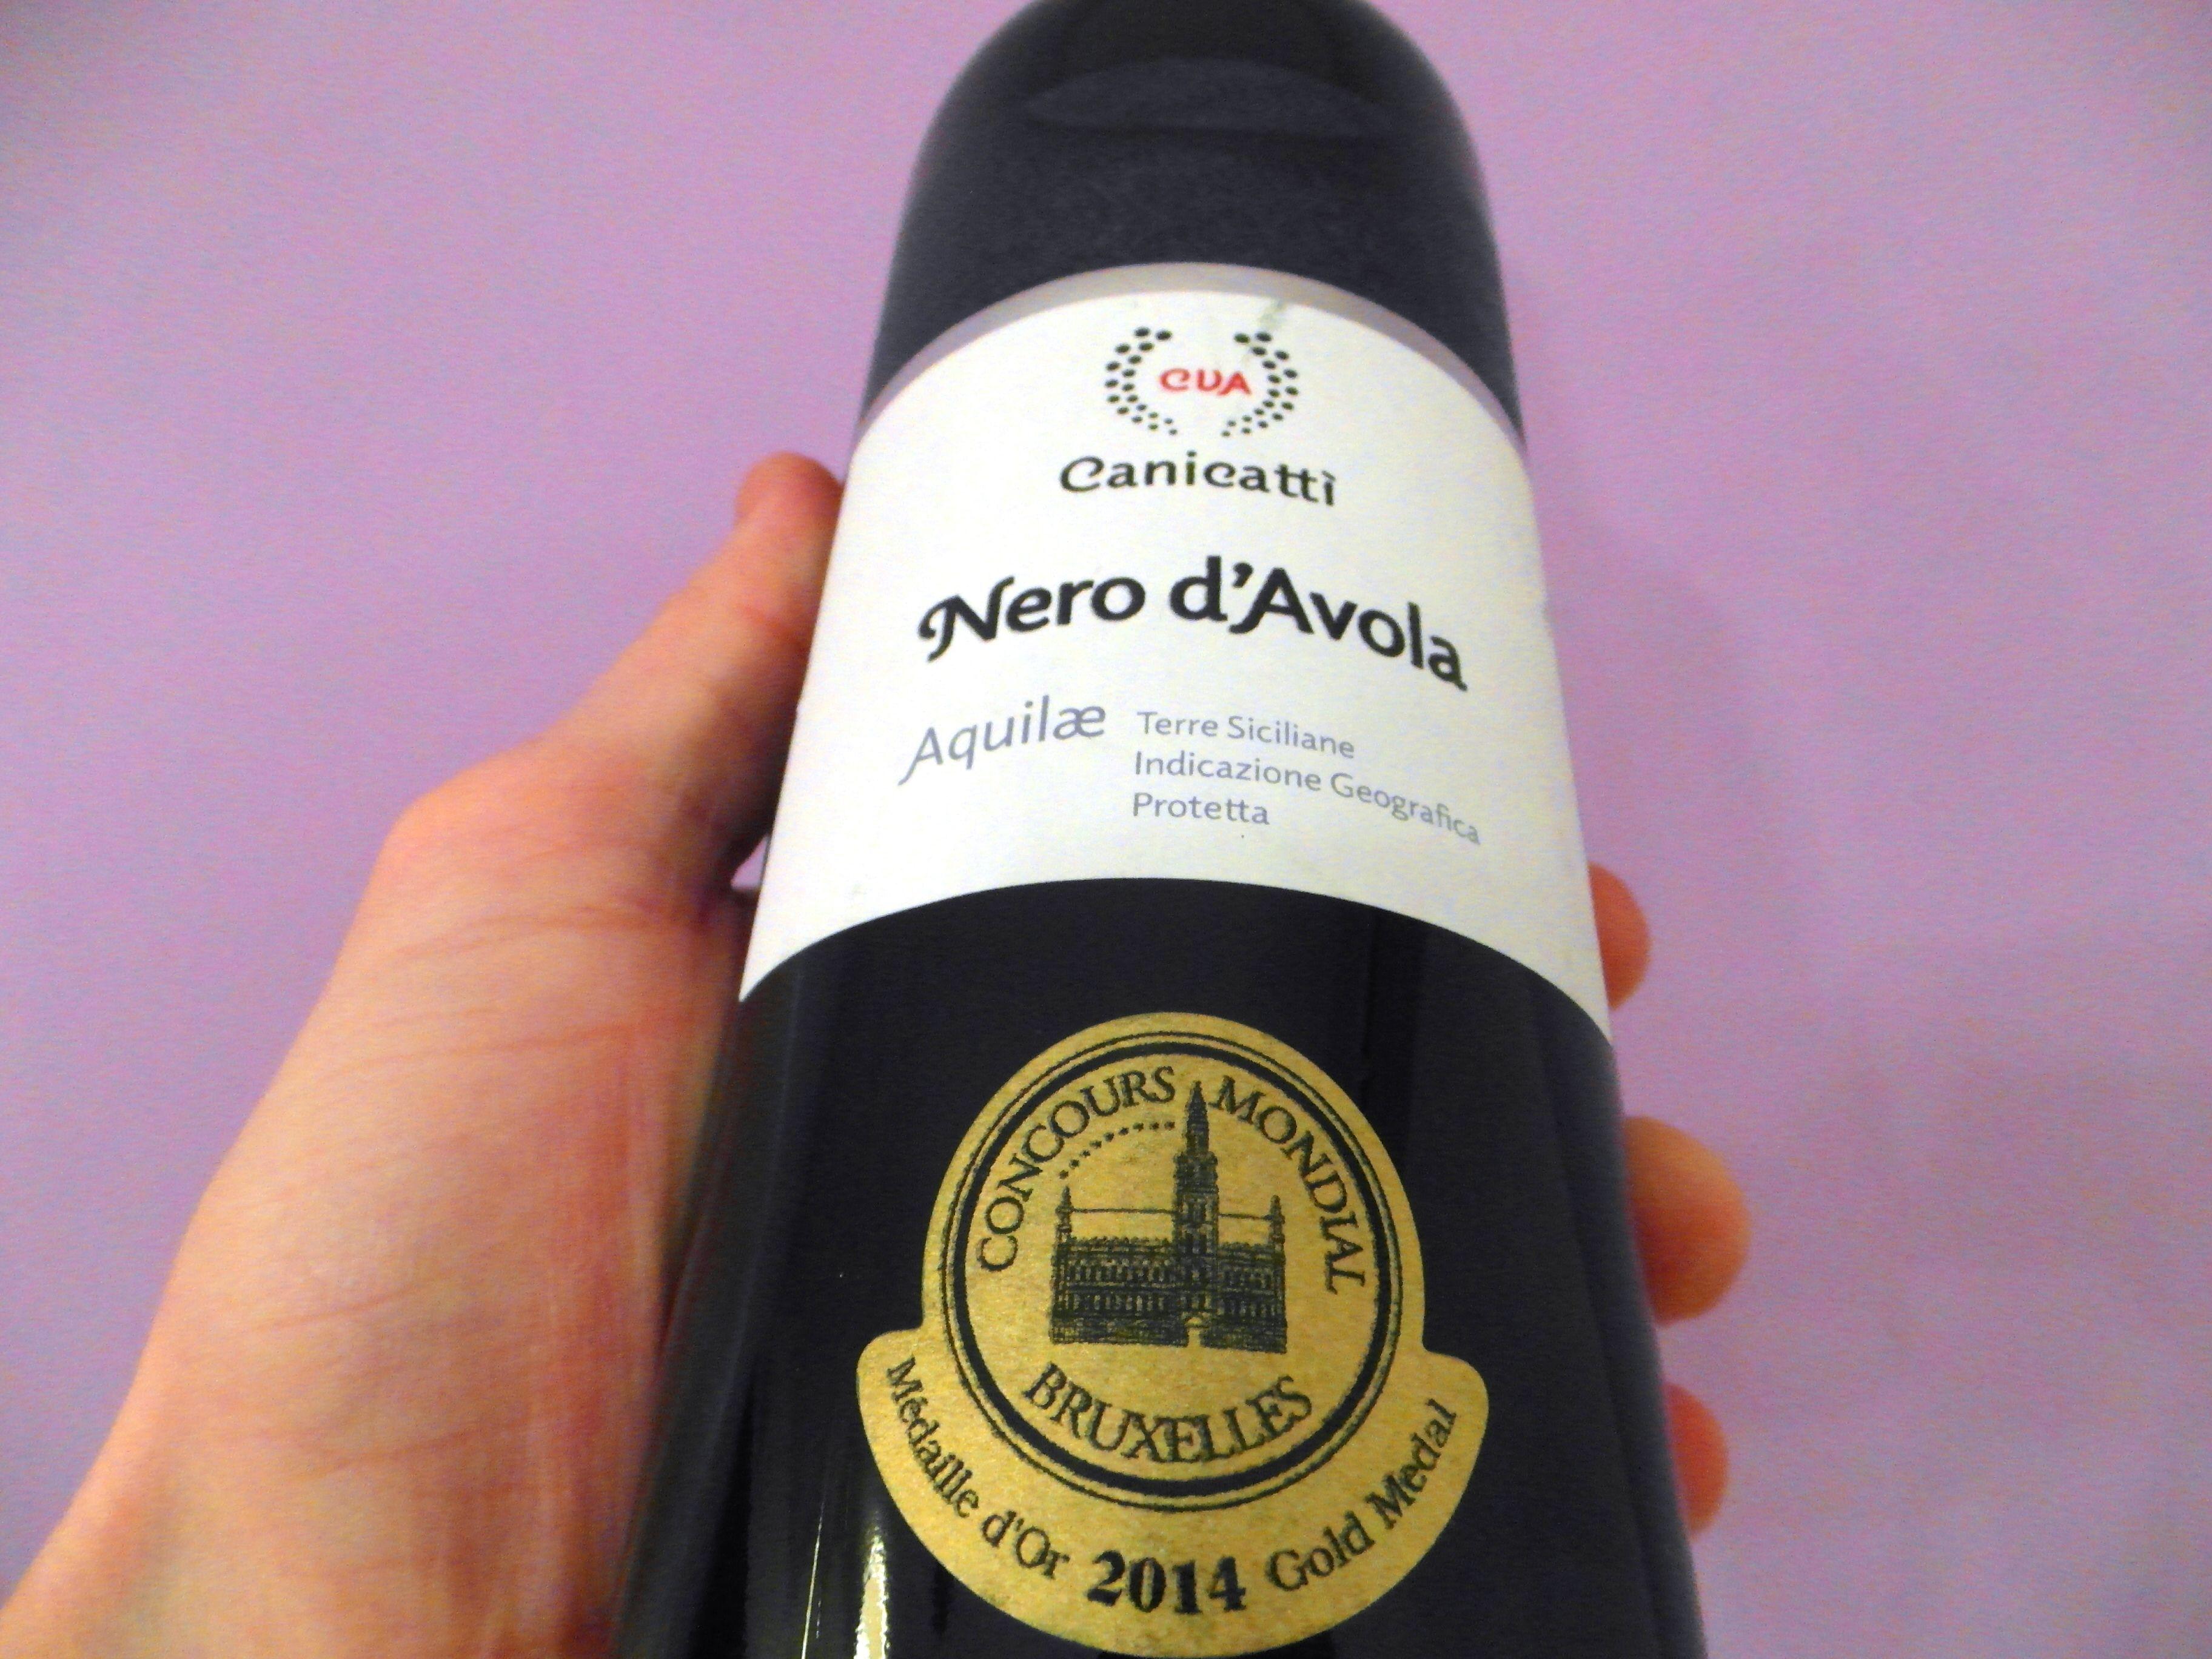 Nero d Avola Sicilia  #nerodavola #sicilia #concourmondialbruxelles